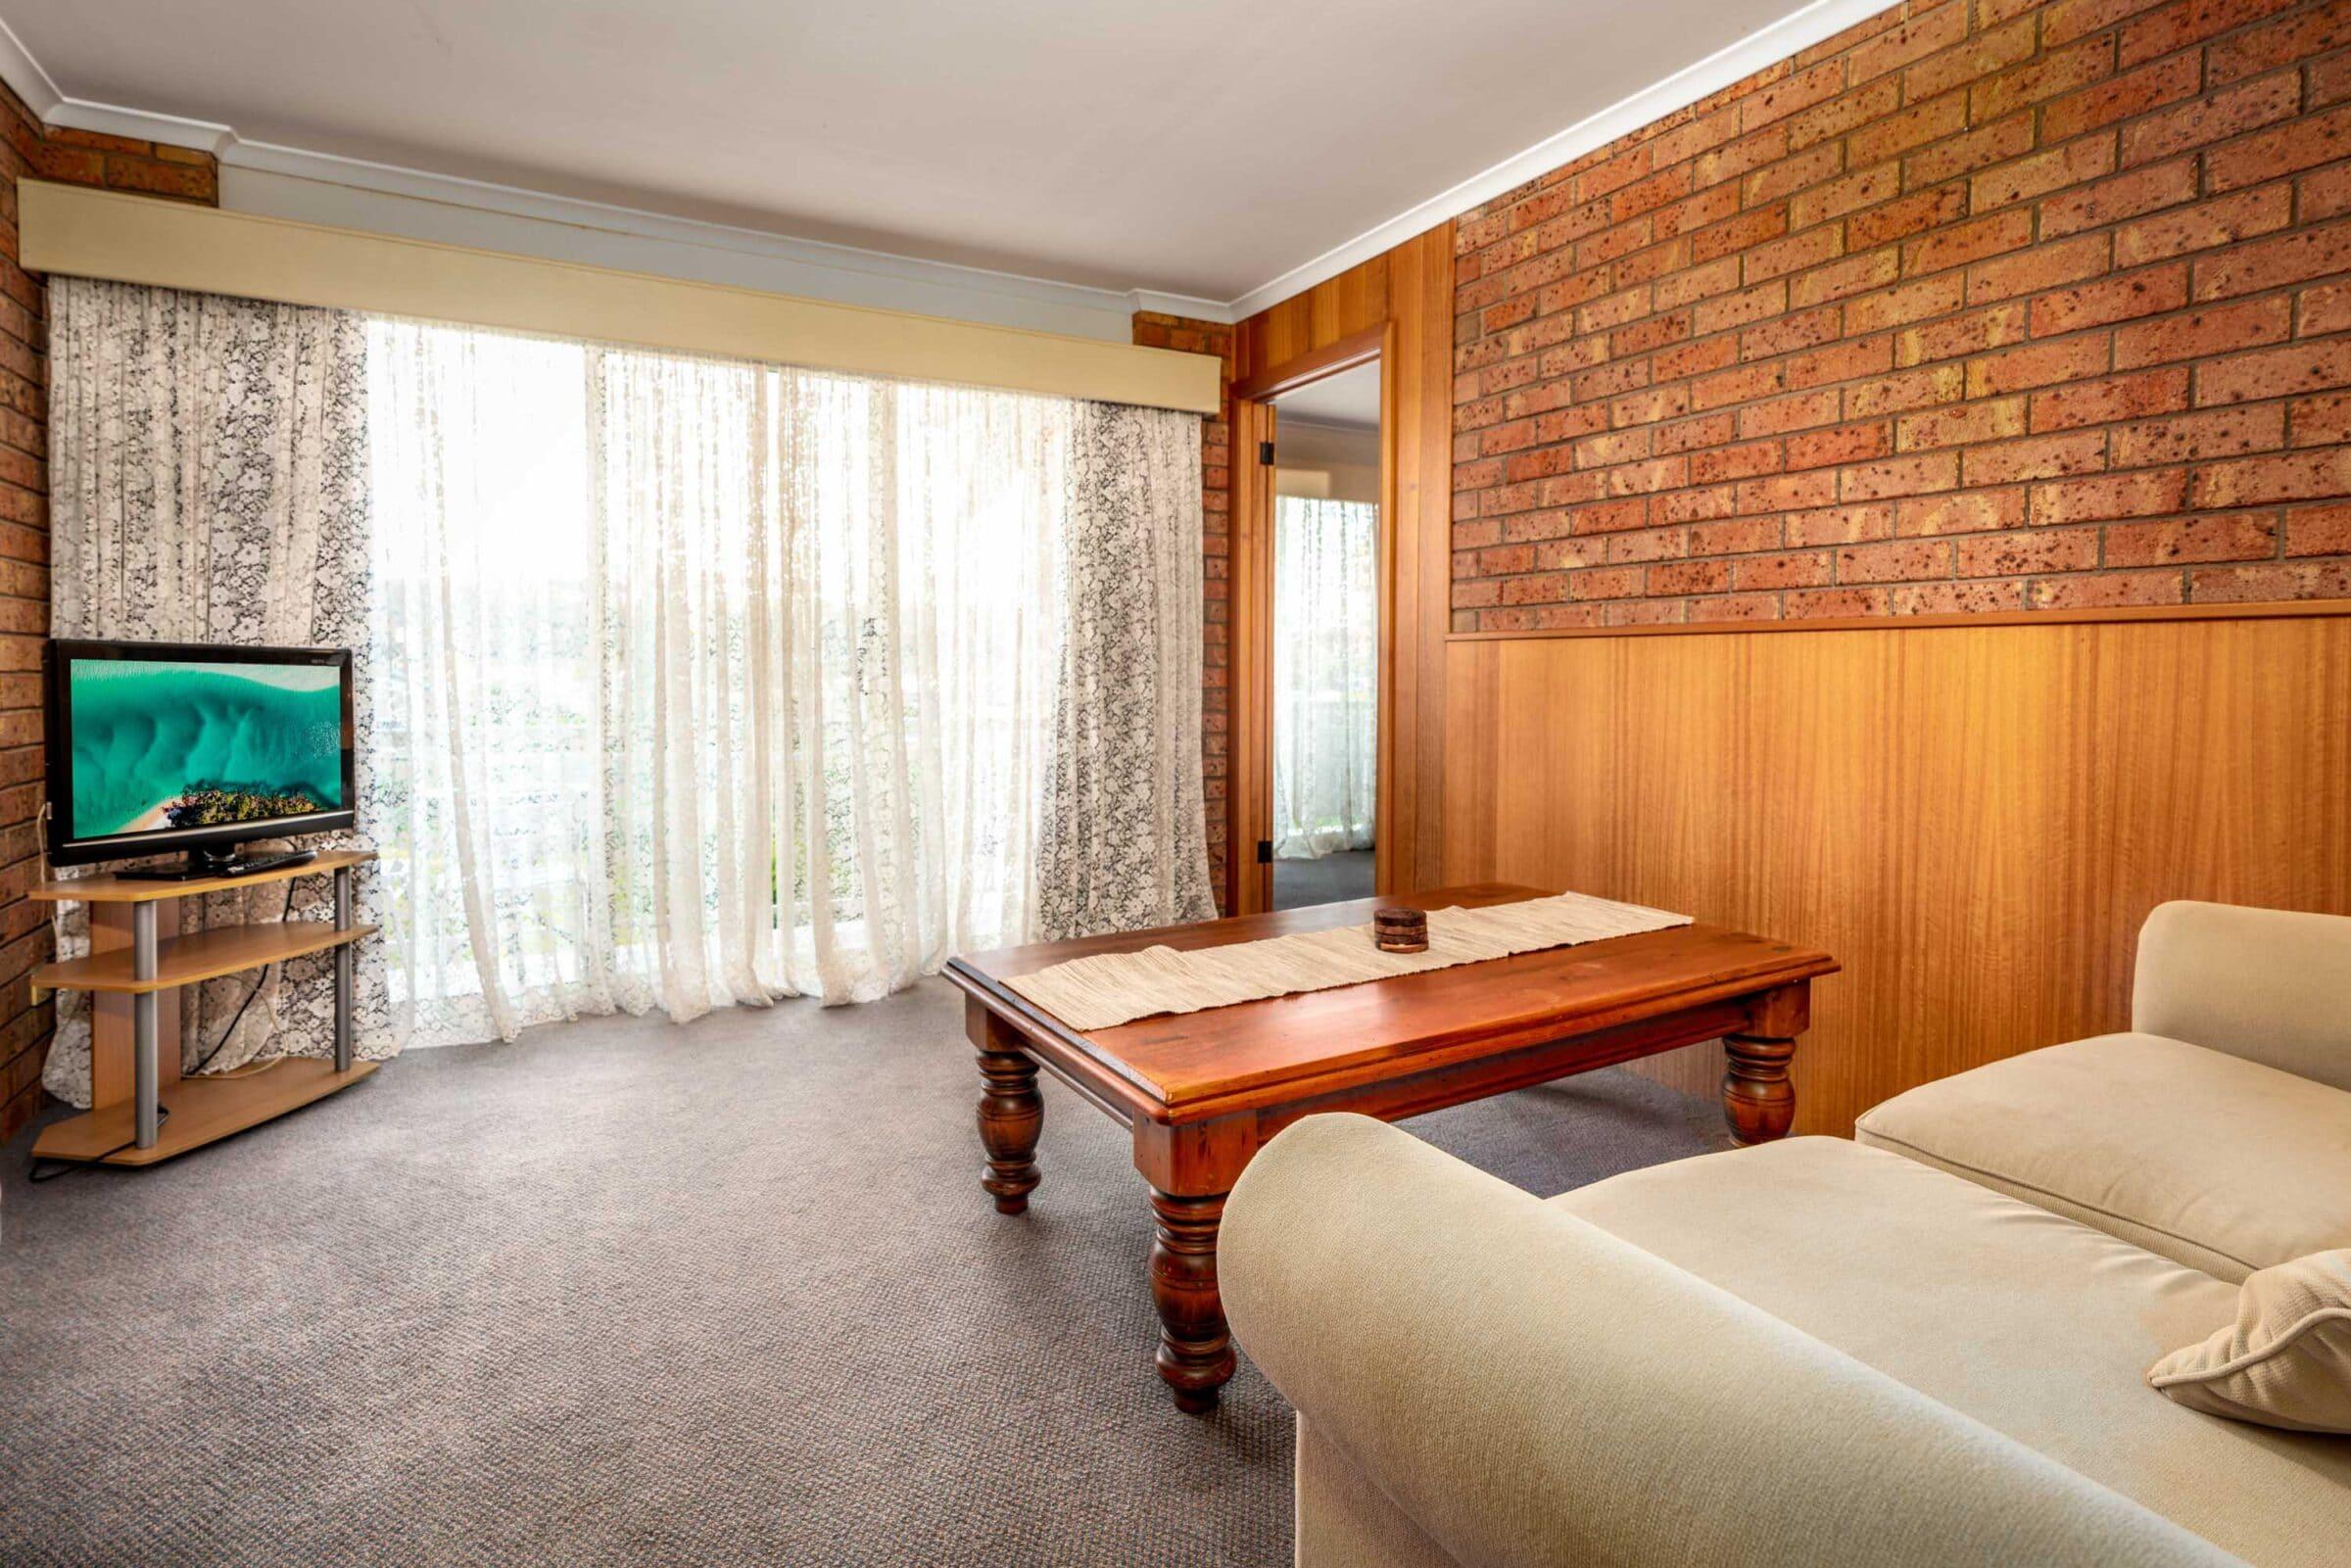 15-Lounge Suite-15 Small Suite Merimbula Motel Accommodation - Comfort Inn Merimbula